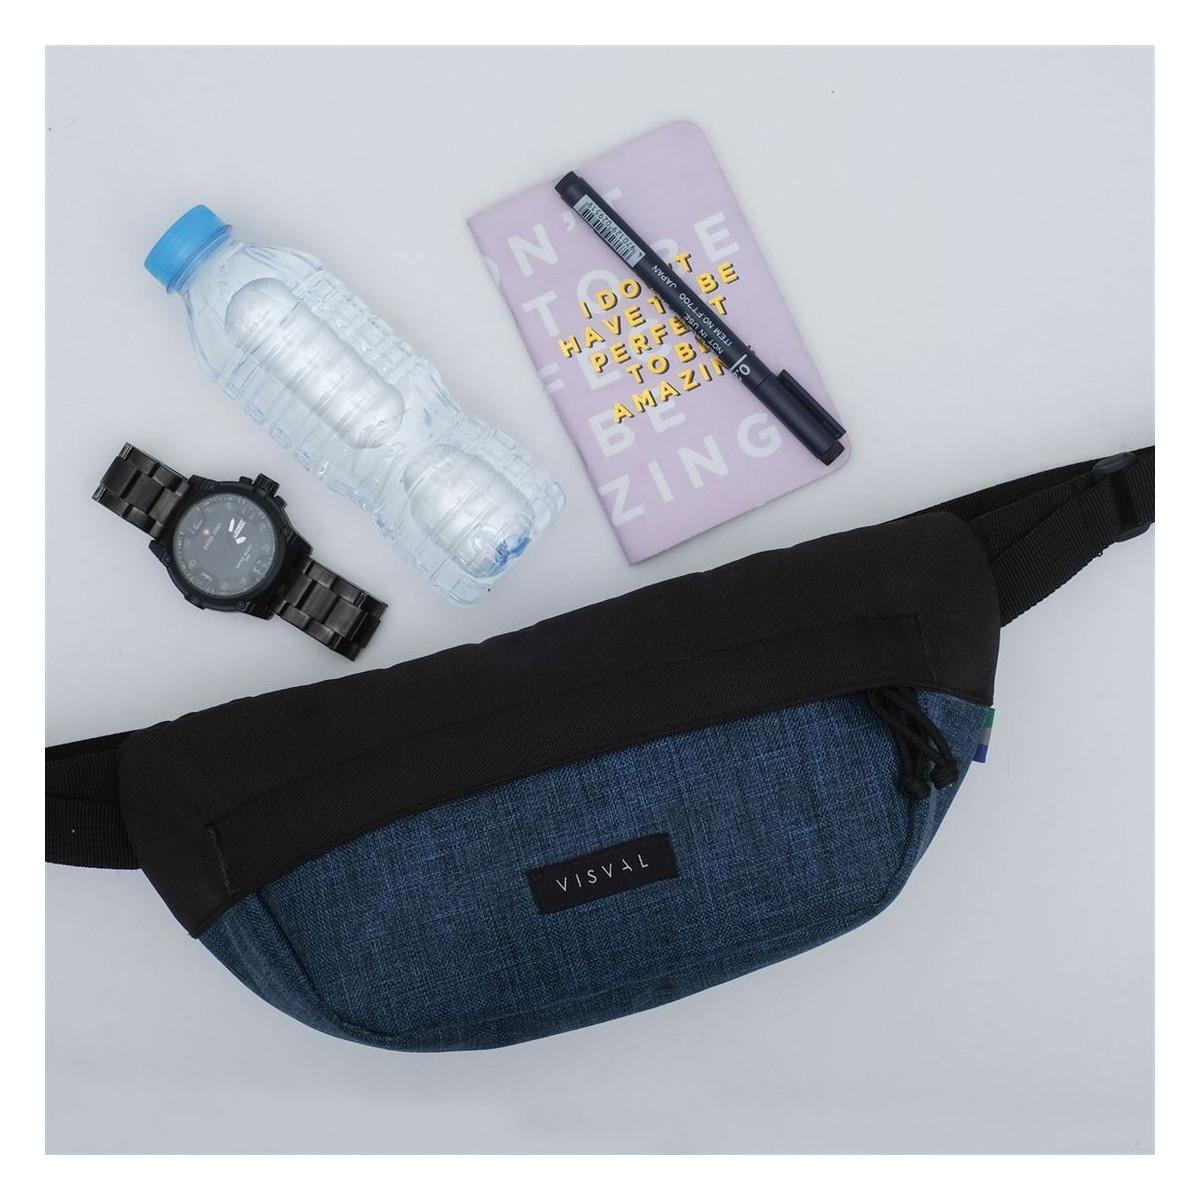 PACER WAIST BAG CORAL BLUE BLACK | VISVAL WAIST BAG - TAS PINGGANG VISVAL